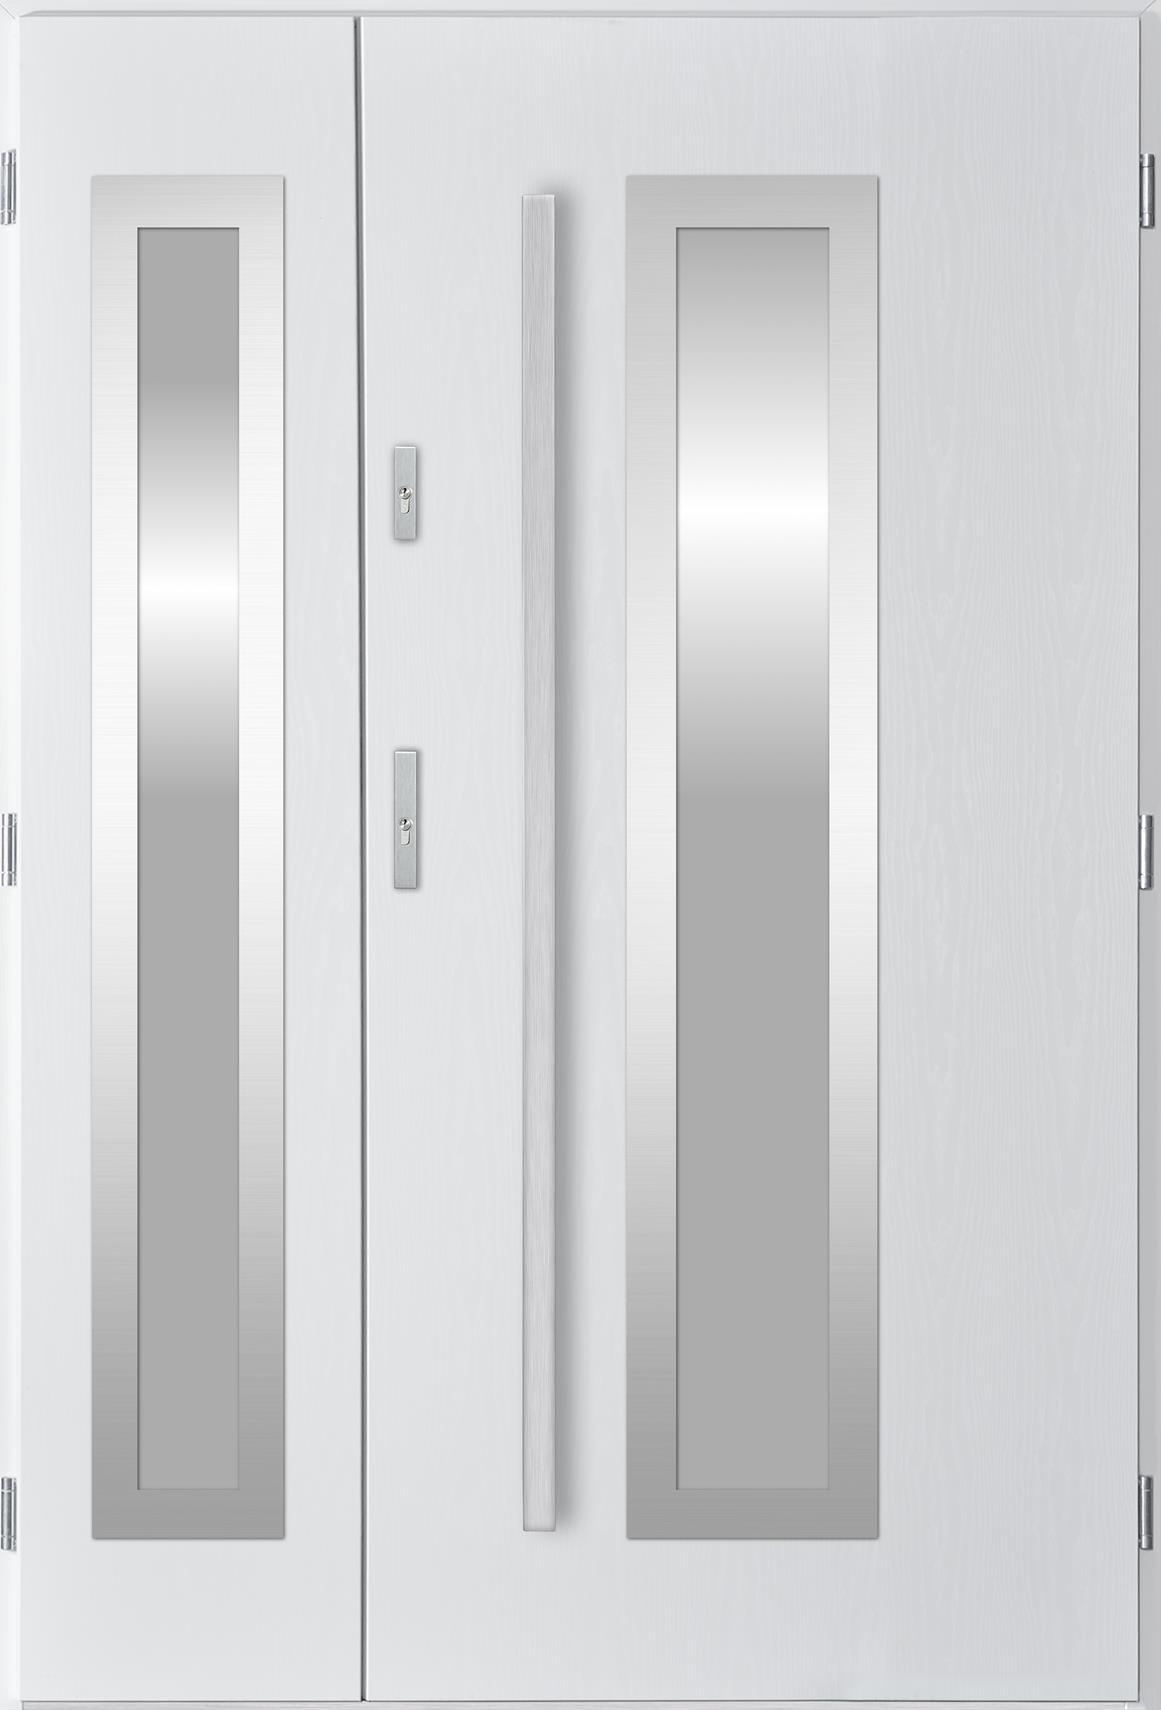 Dvoukøídlé ocelové vchodové dveøe Hevelio, bílá